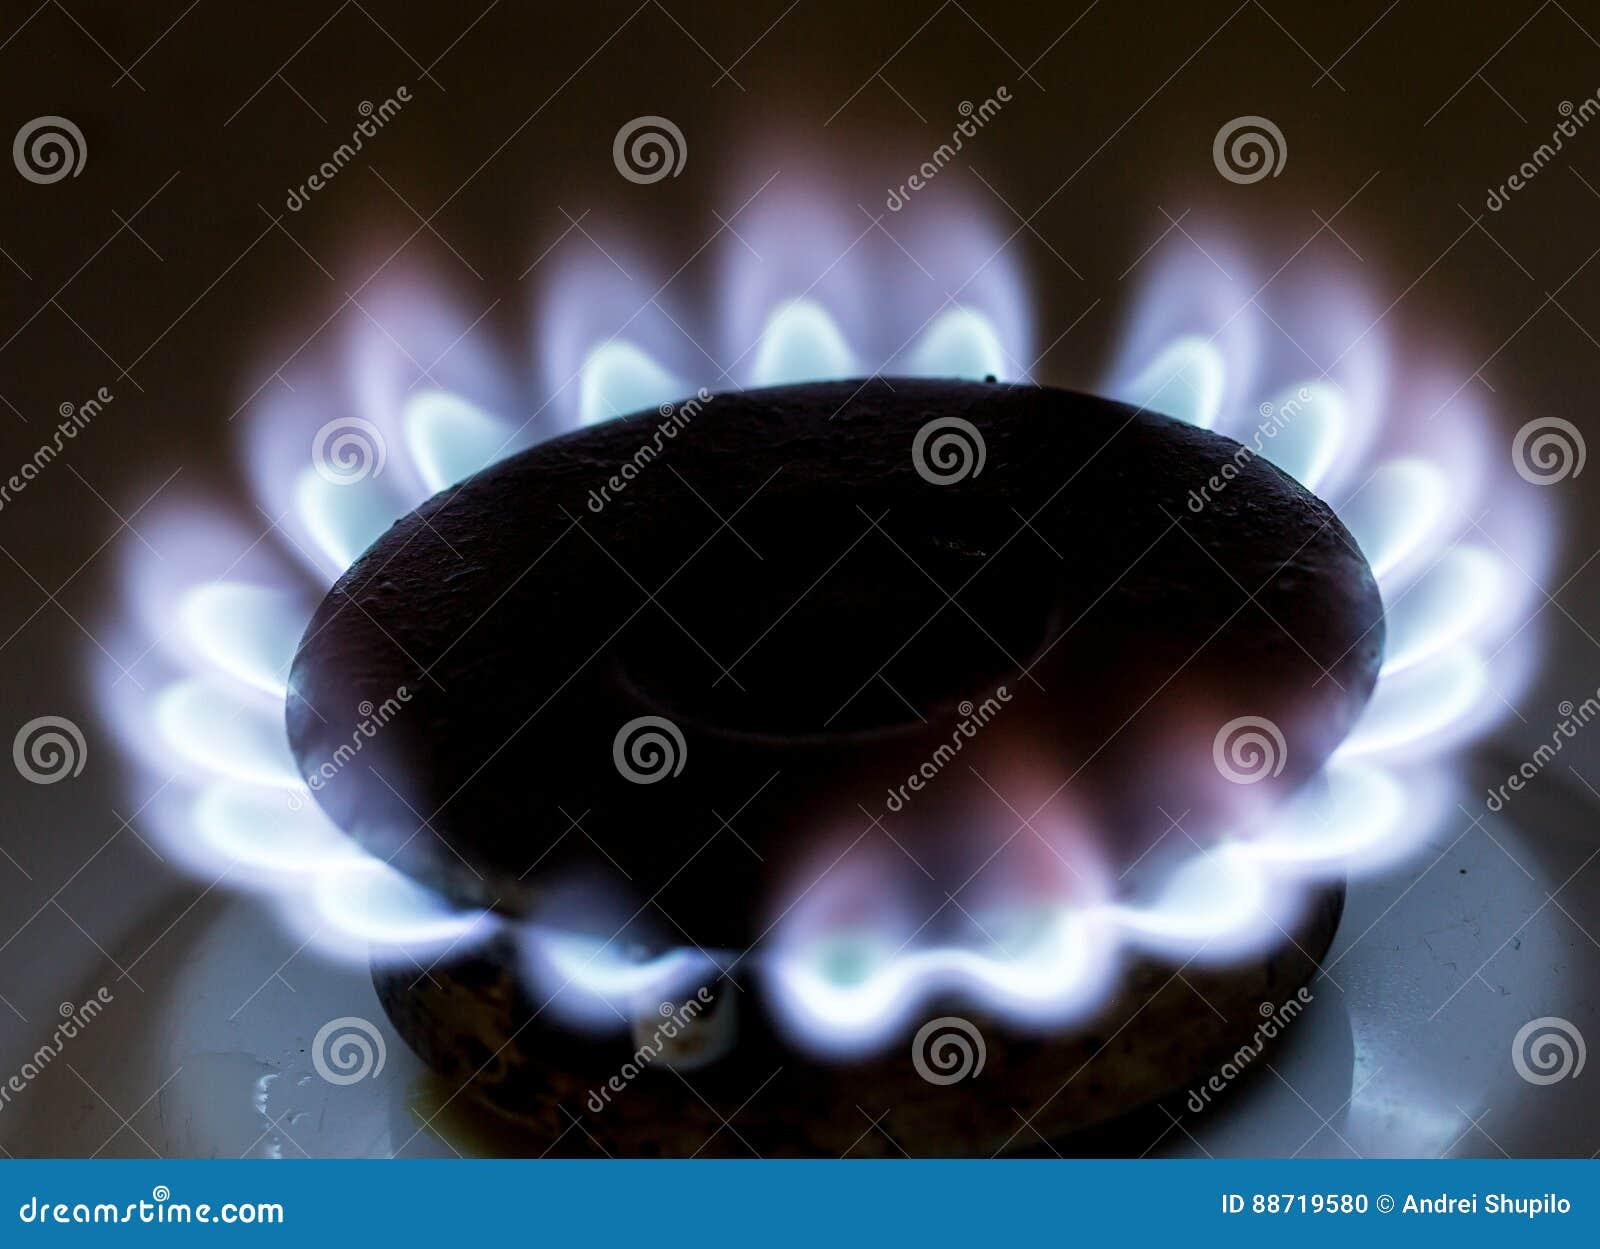 Natural Gas Flame Cartoon Vector 11526775